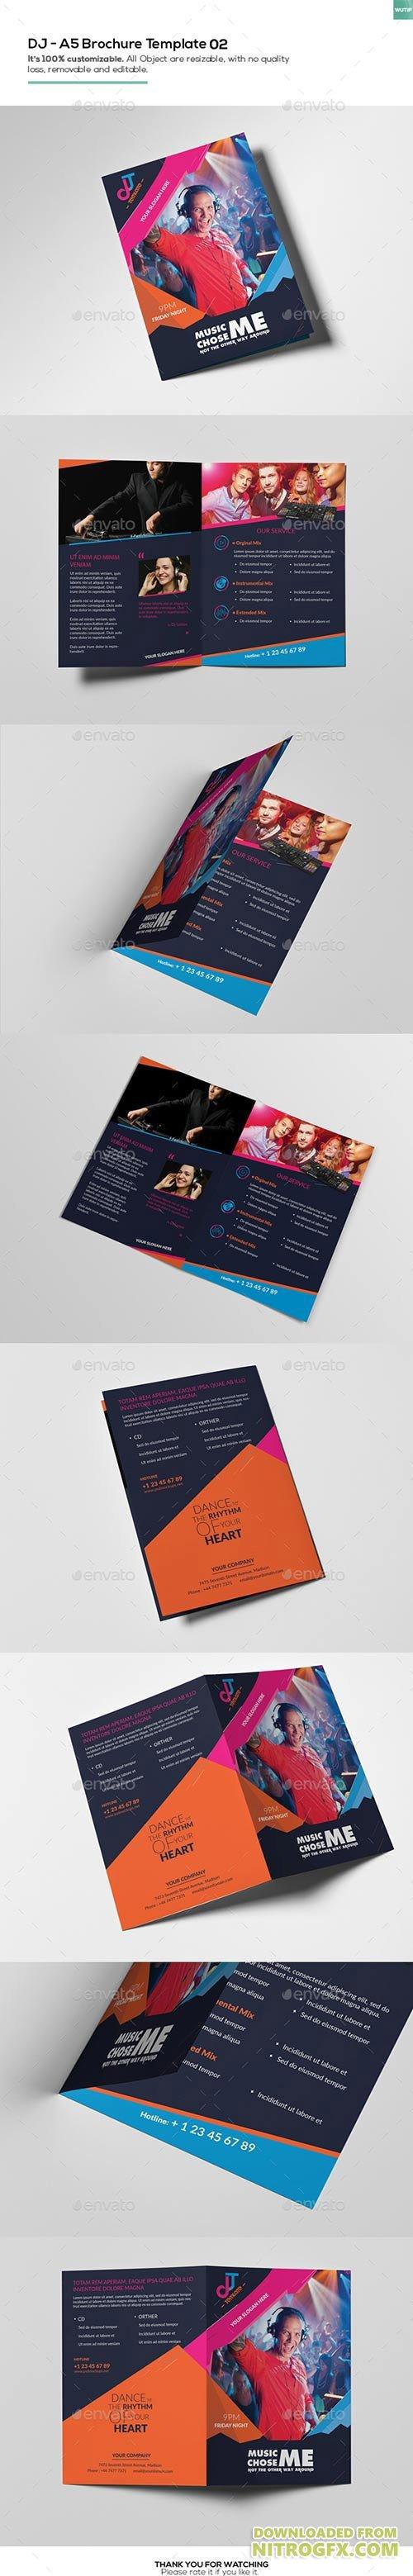 Dj a5 brochure template 02 16207061 nitrogfx download for A5 brochure template